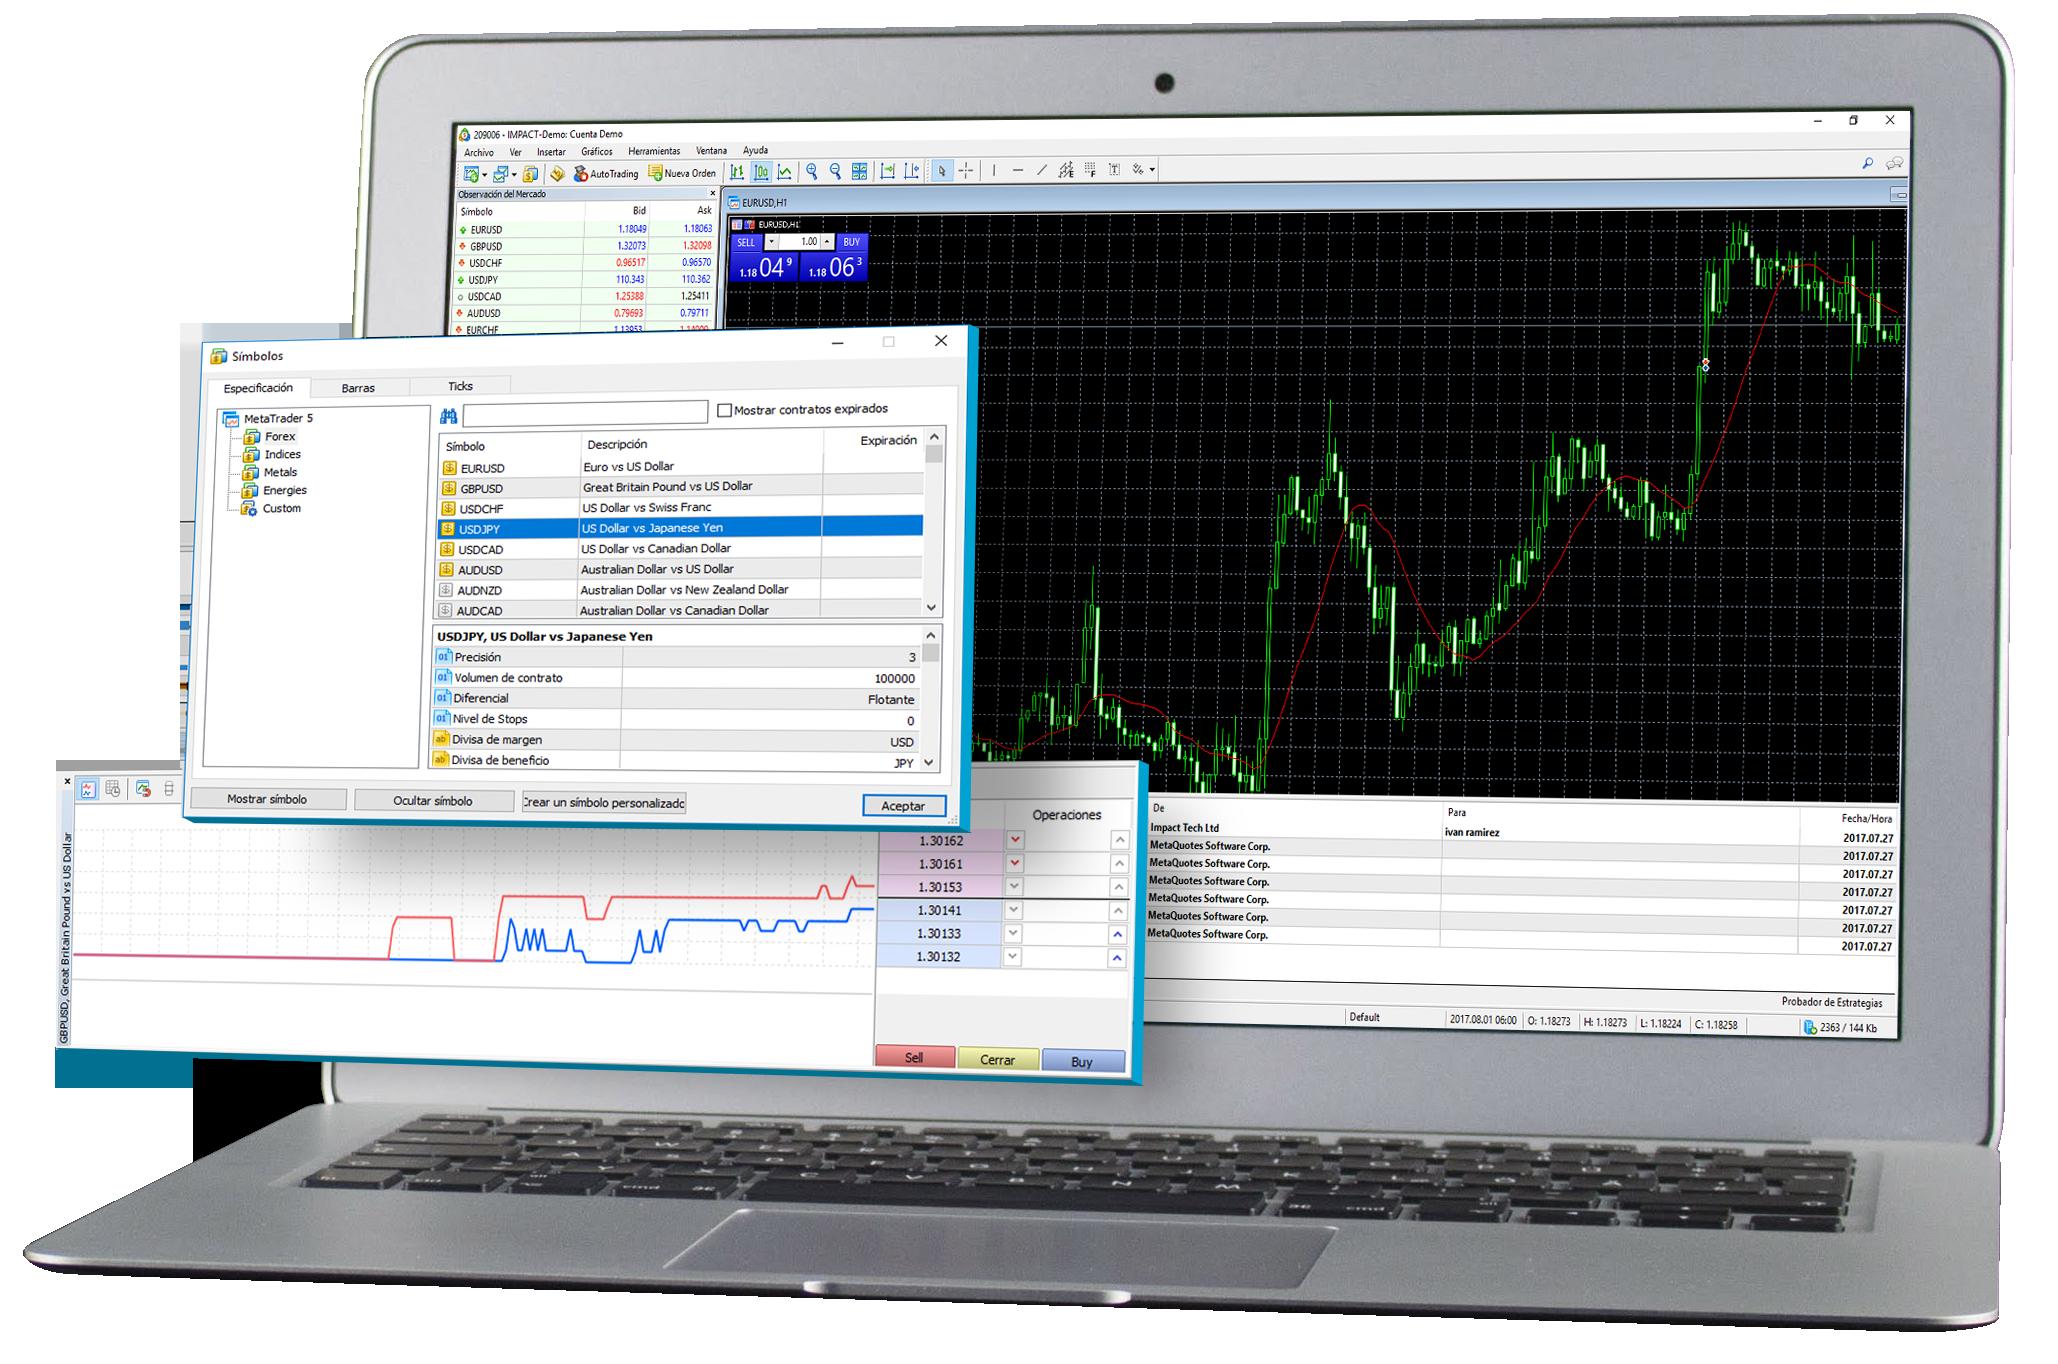 MT5 Trading Platform